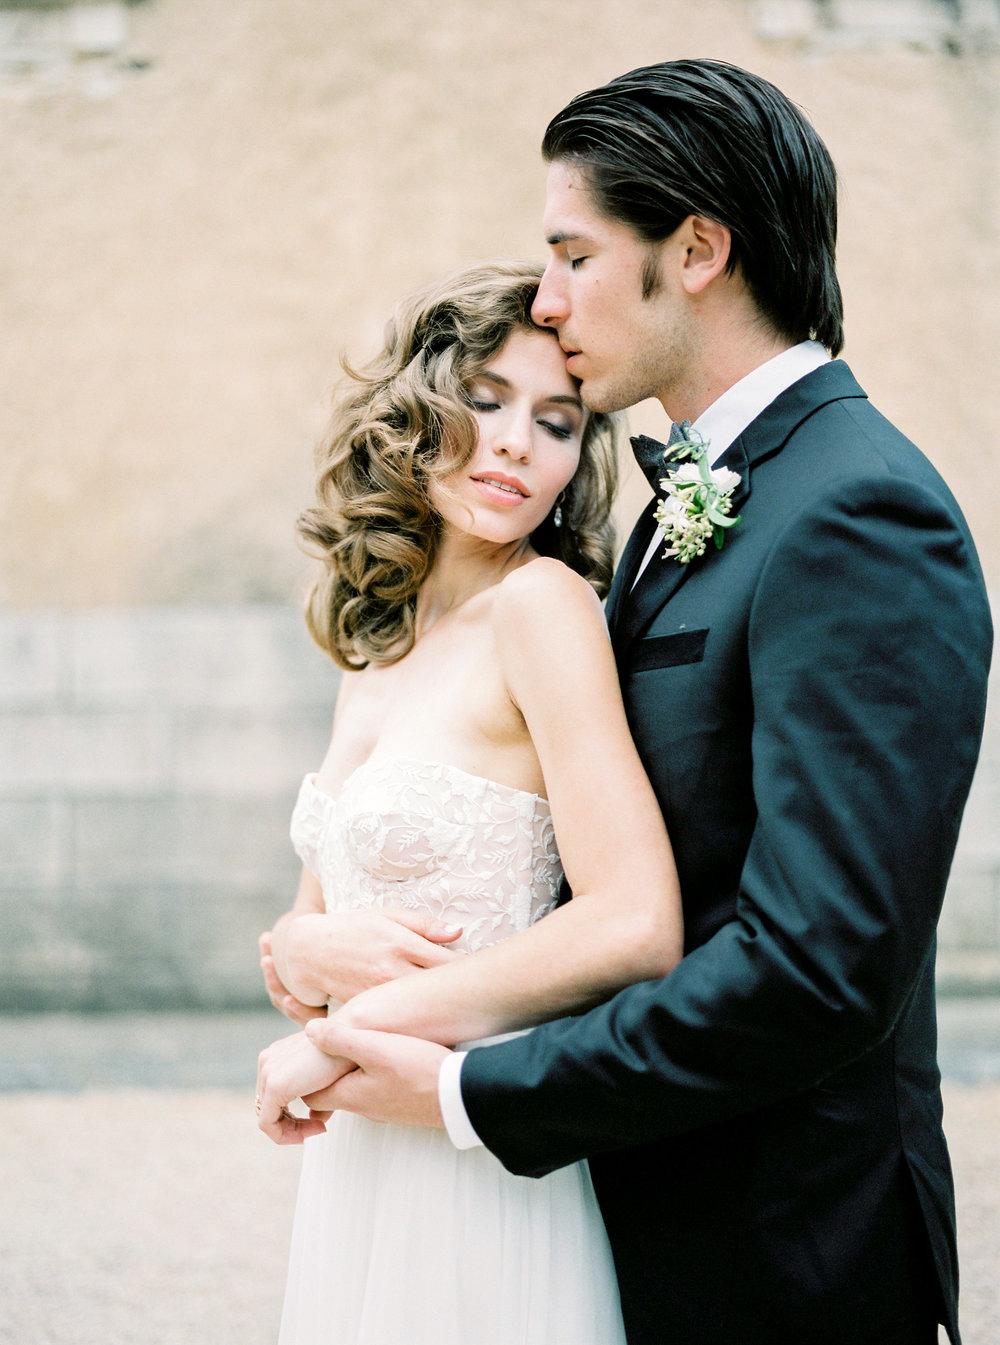 kaylabarker_coupleshoots-18.jpg